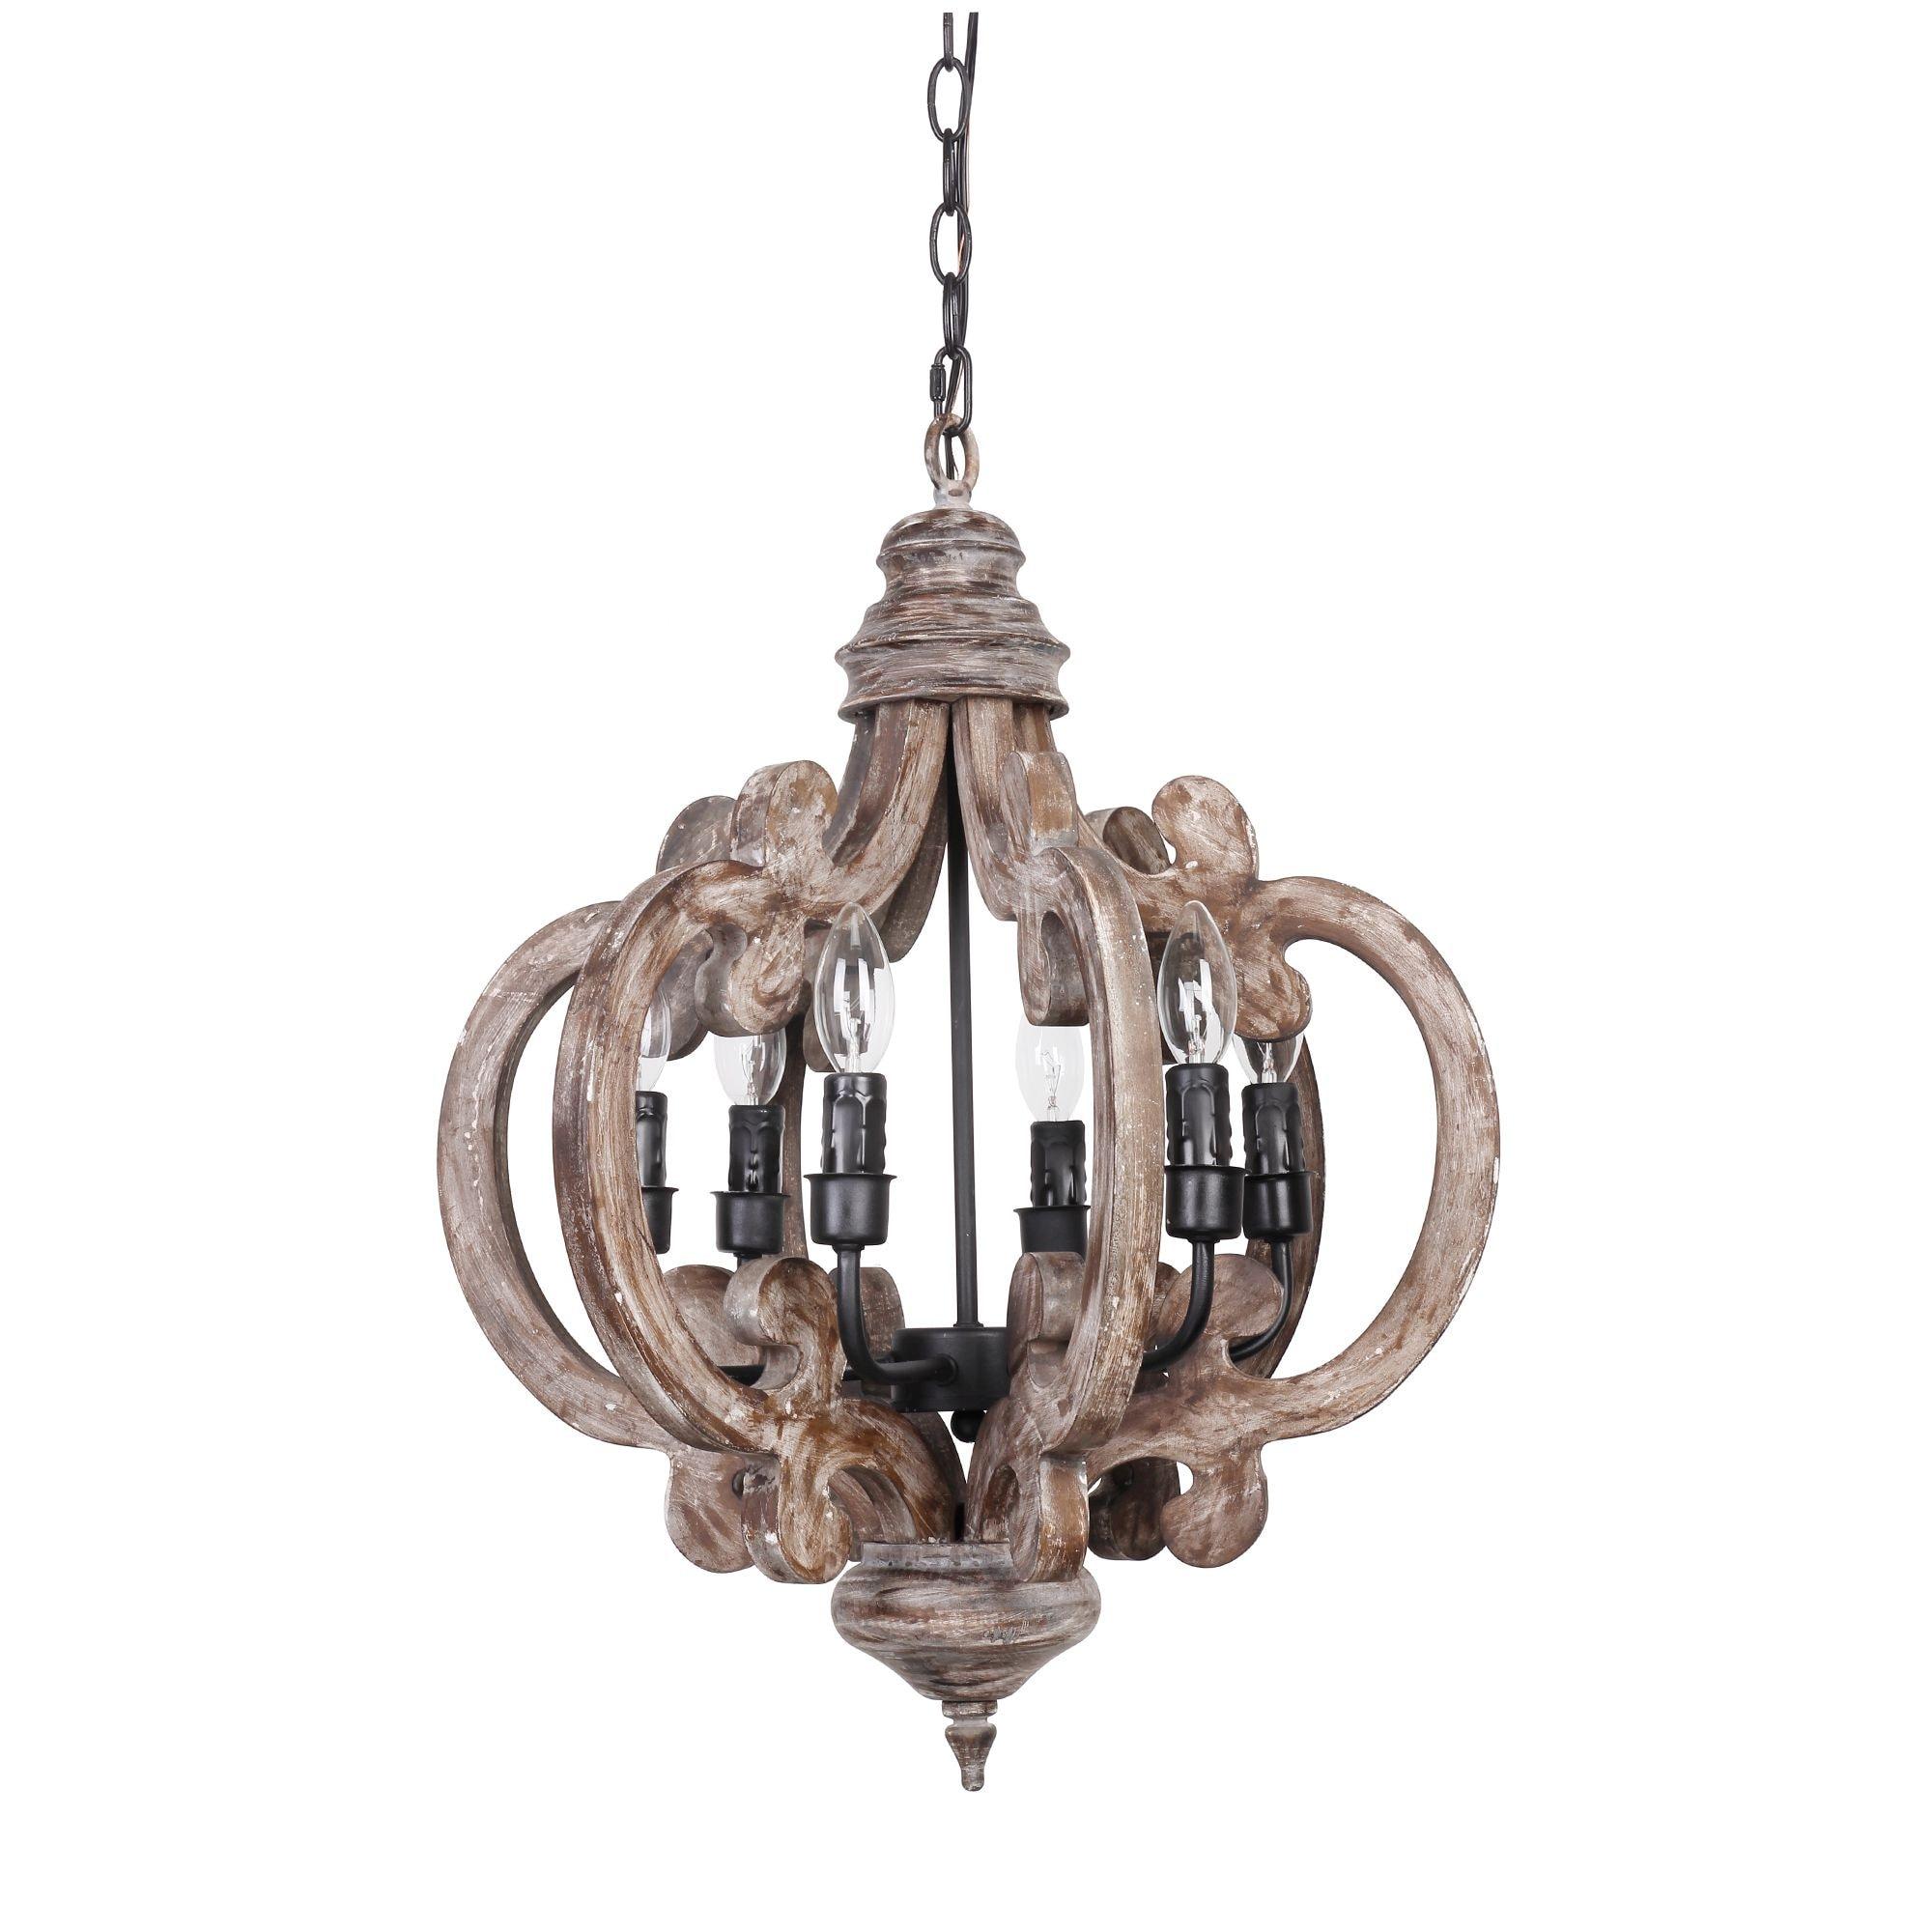 wood chandelier lighting. Distressed Antique White 6-Light Wood Chandelier Lighting E